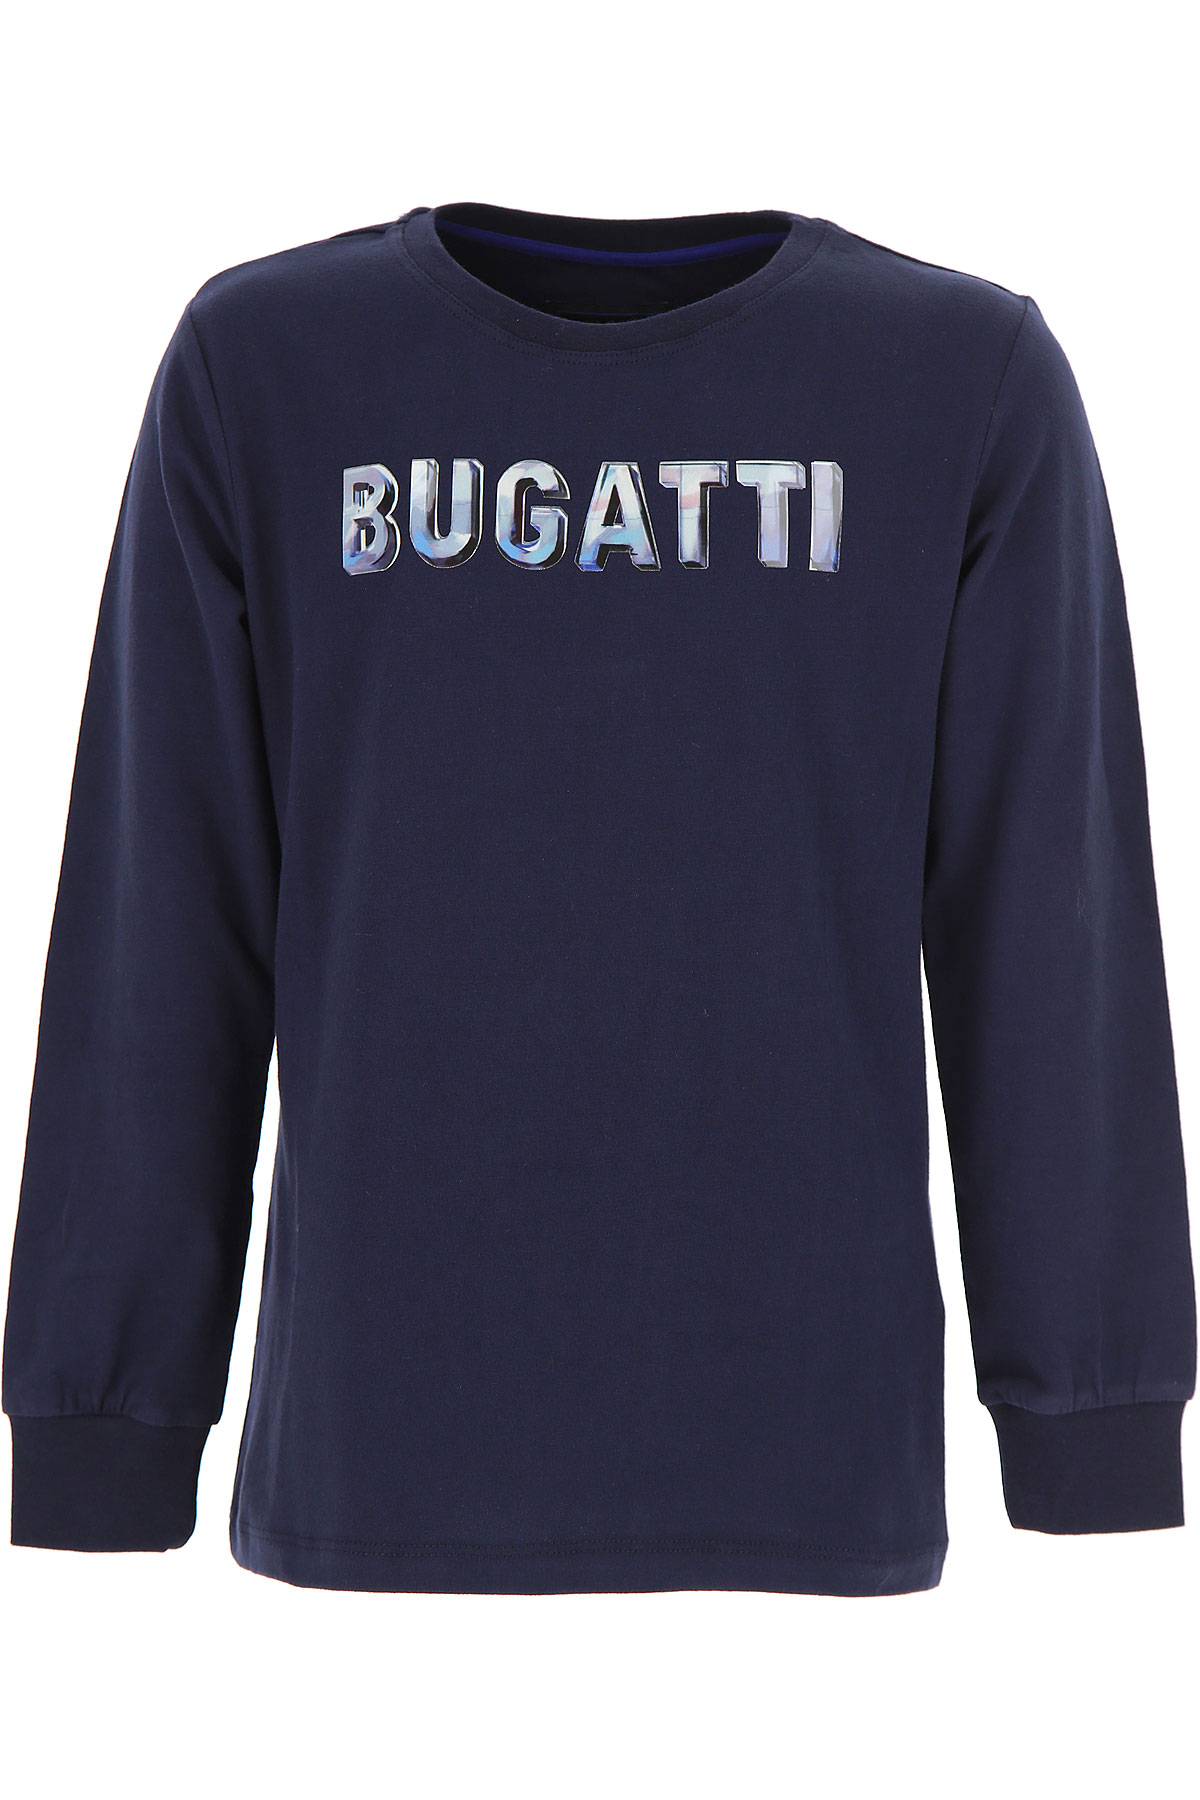 Image of Bugatti Kids T-Shirt for Boys, Blue, Cotton, 2017, 10Y 8Y